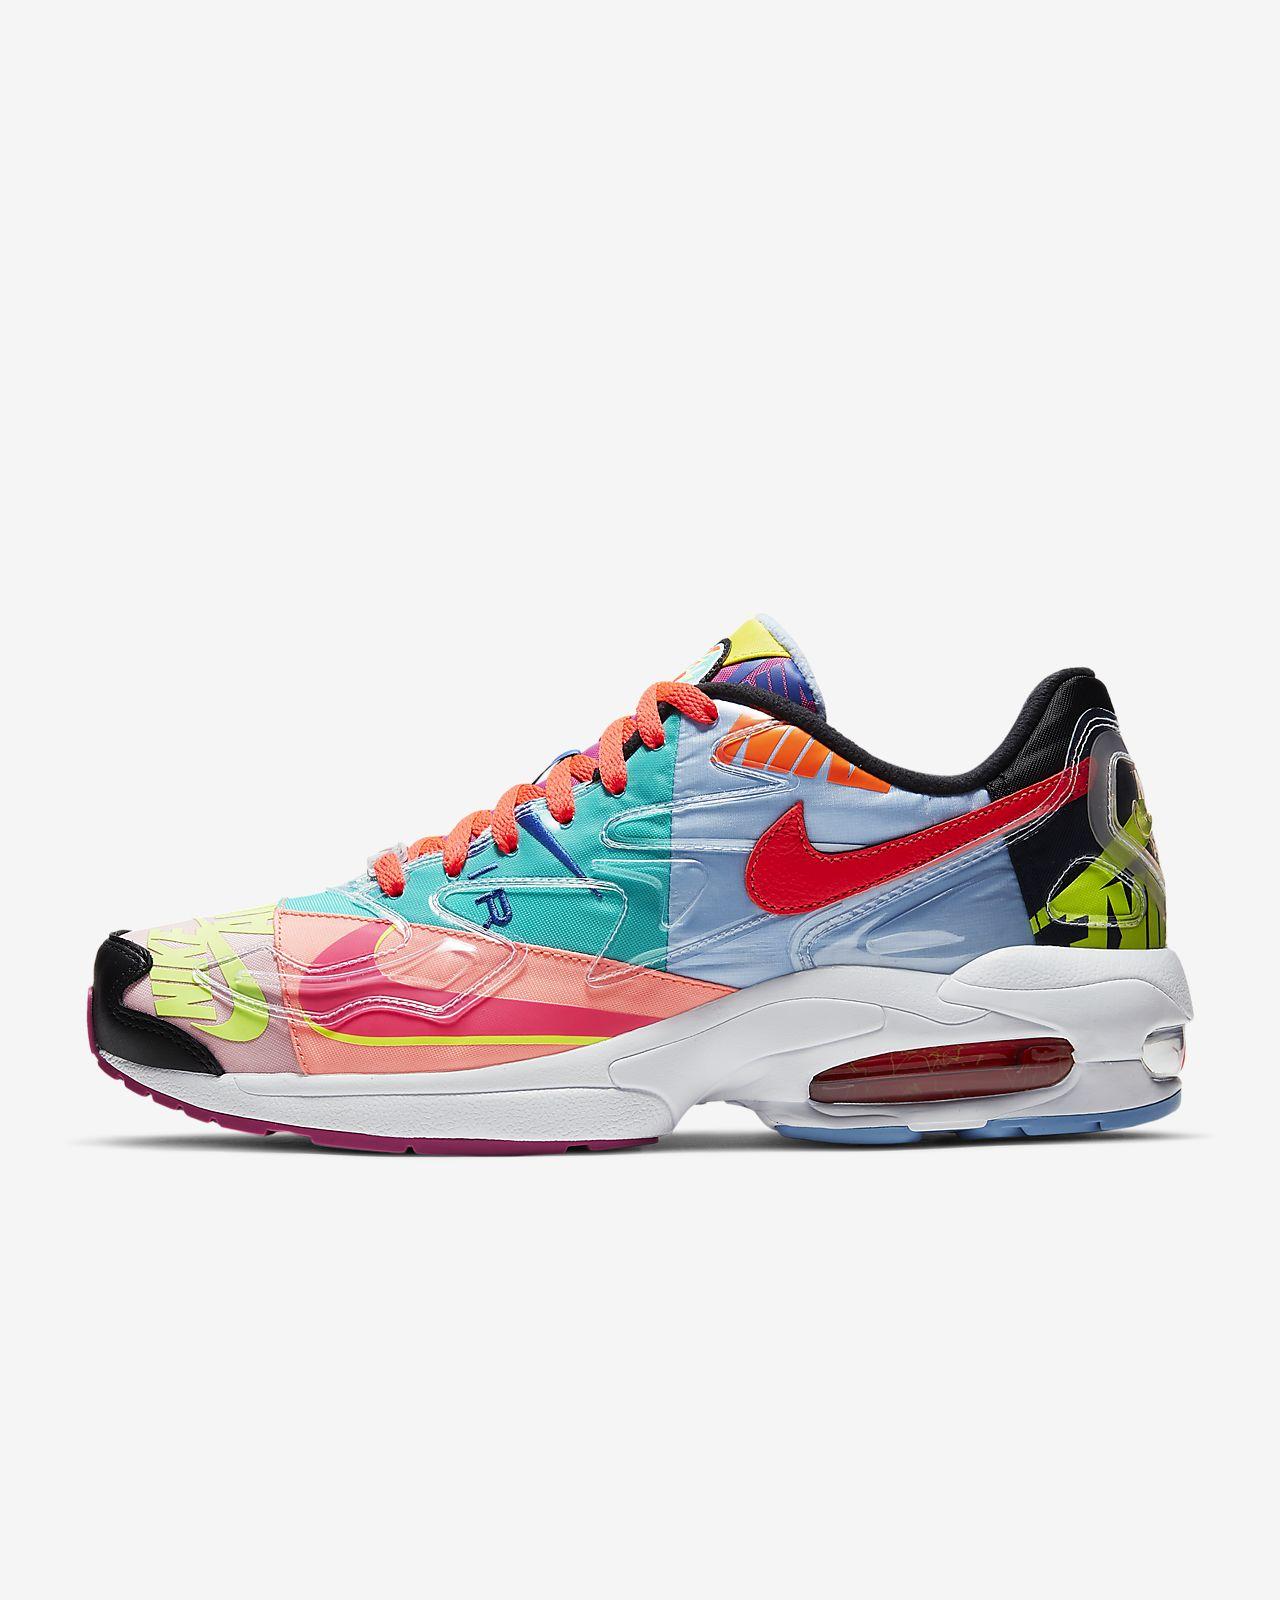 Nike Air Max2 Light QS Men's Shoe